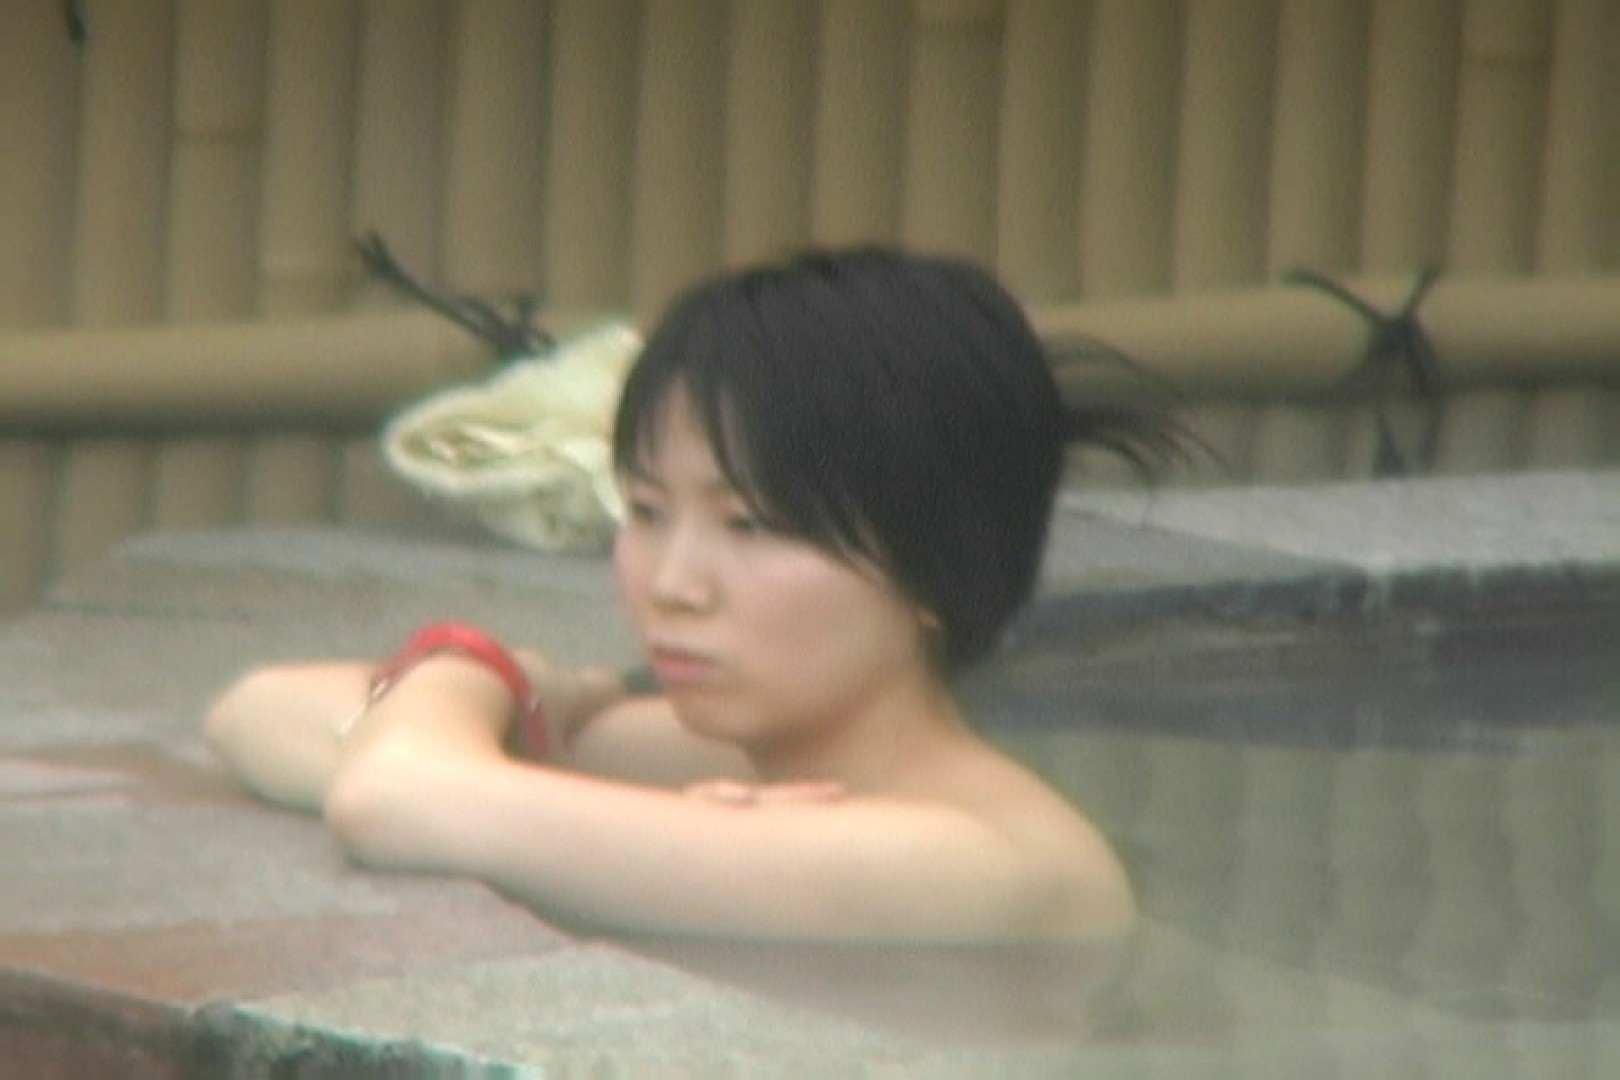 Aquaな露天風呂Vol.567 盗撮  96連発 69